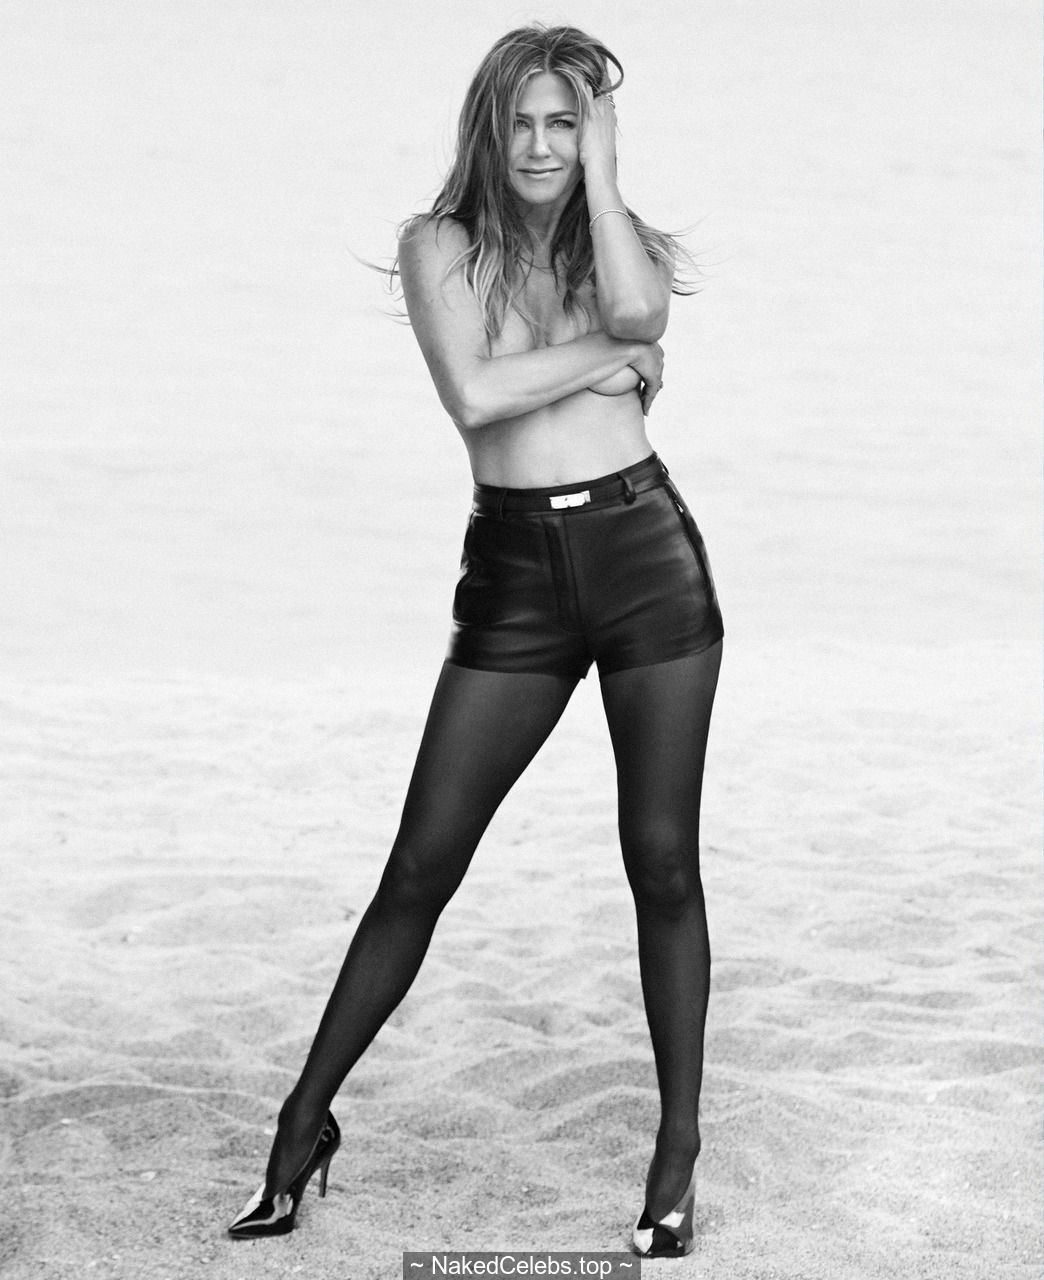 Jennifer Aniston topless but covered for Harper's Bazaar, US June/July 2019